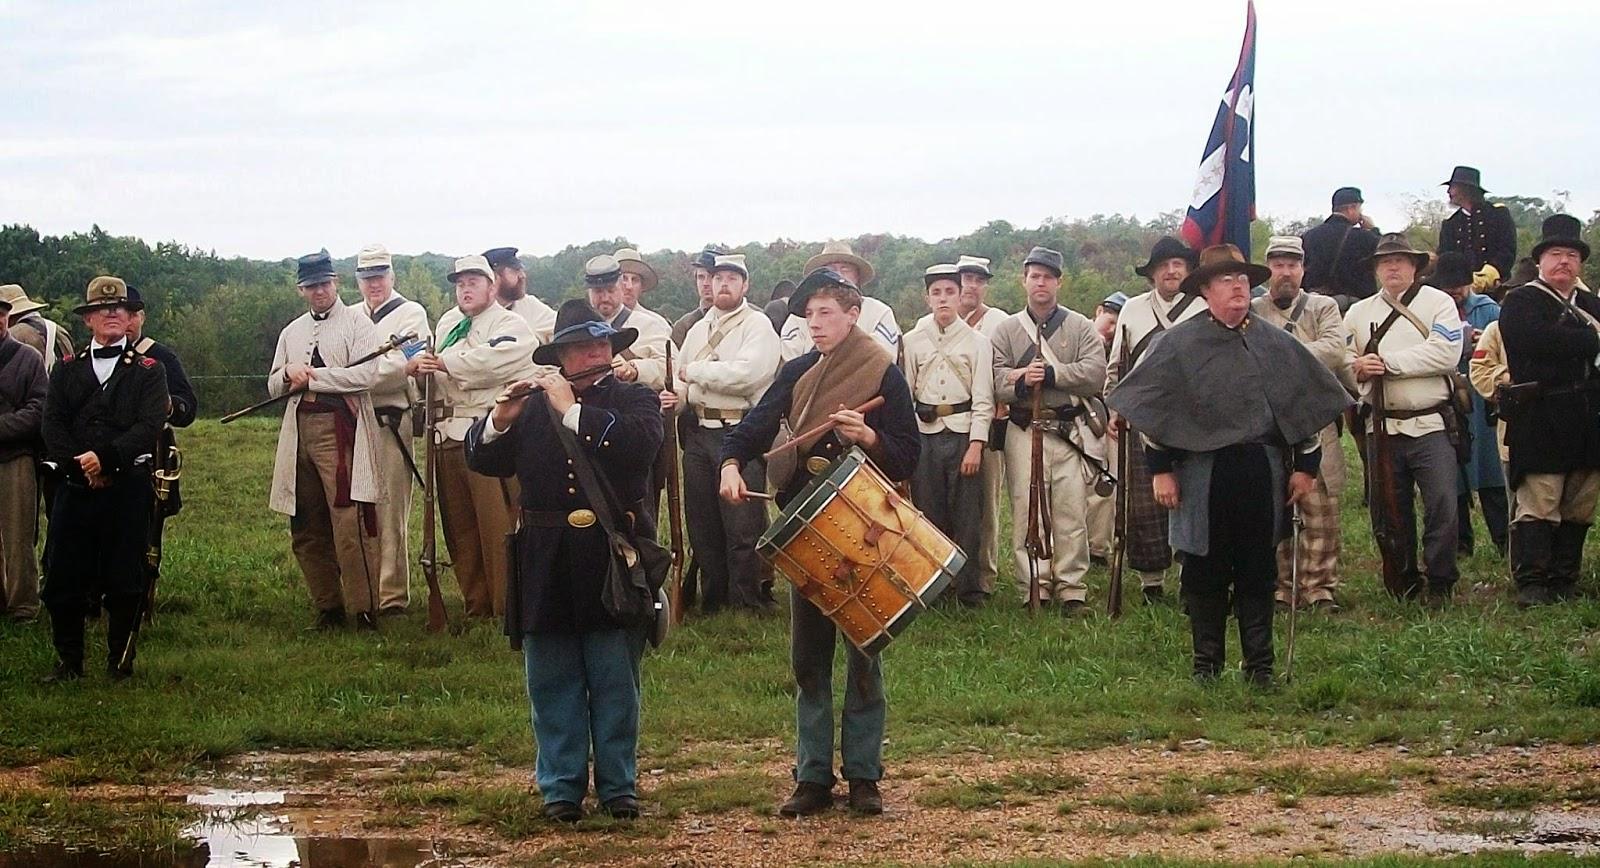 Camden-Miller-Pulaski Missouri History: The Battle of